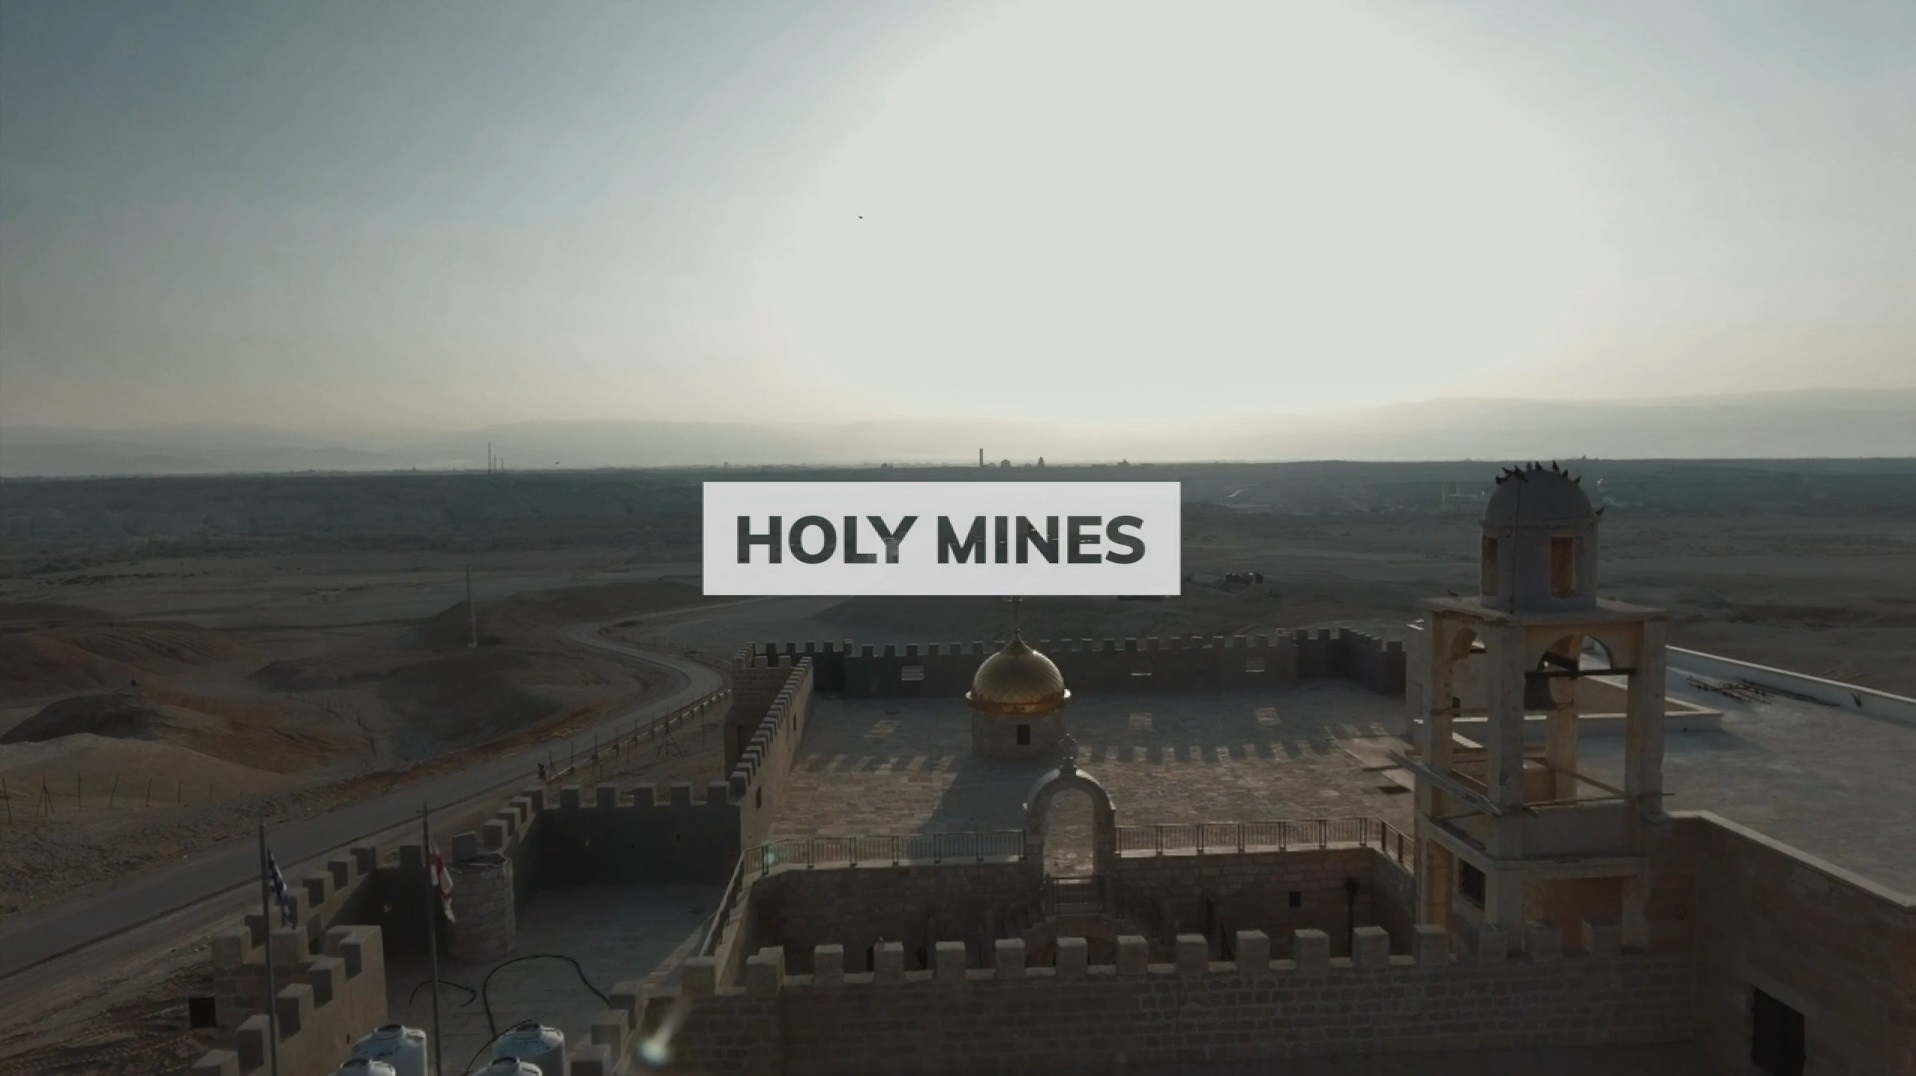 Holy Mines